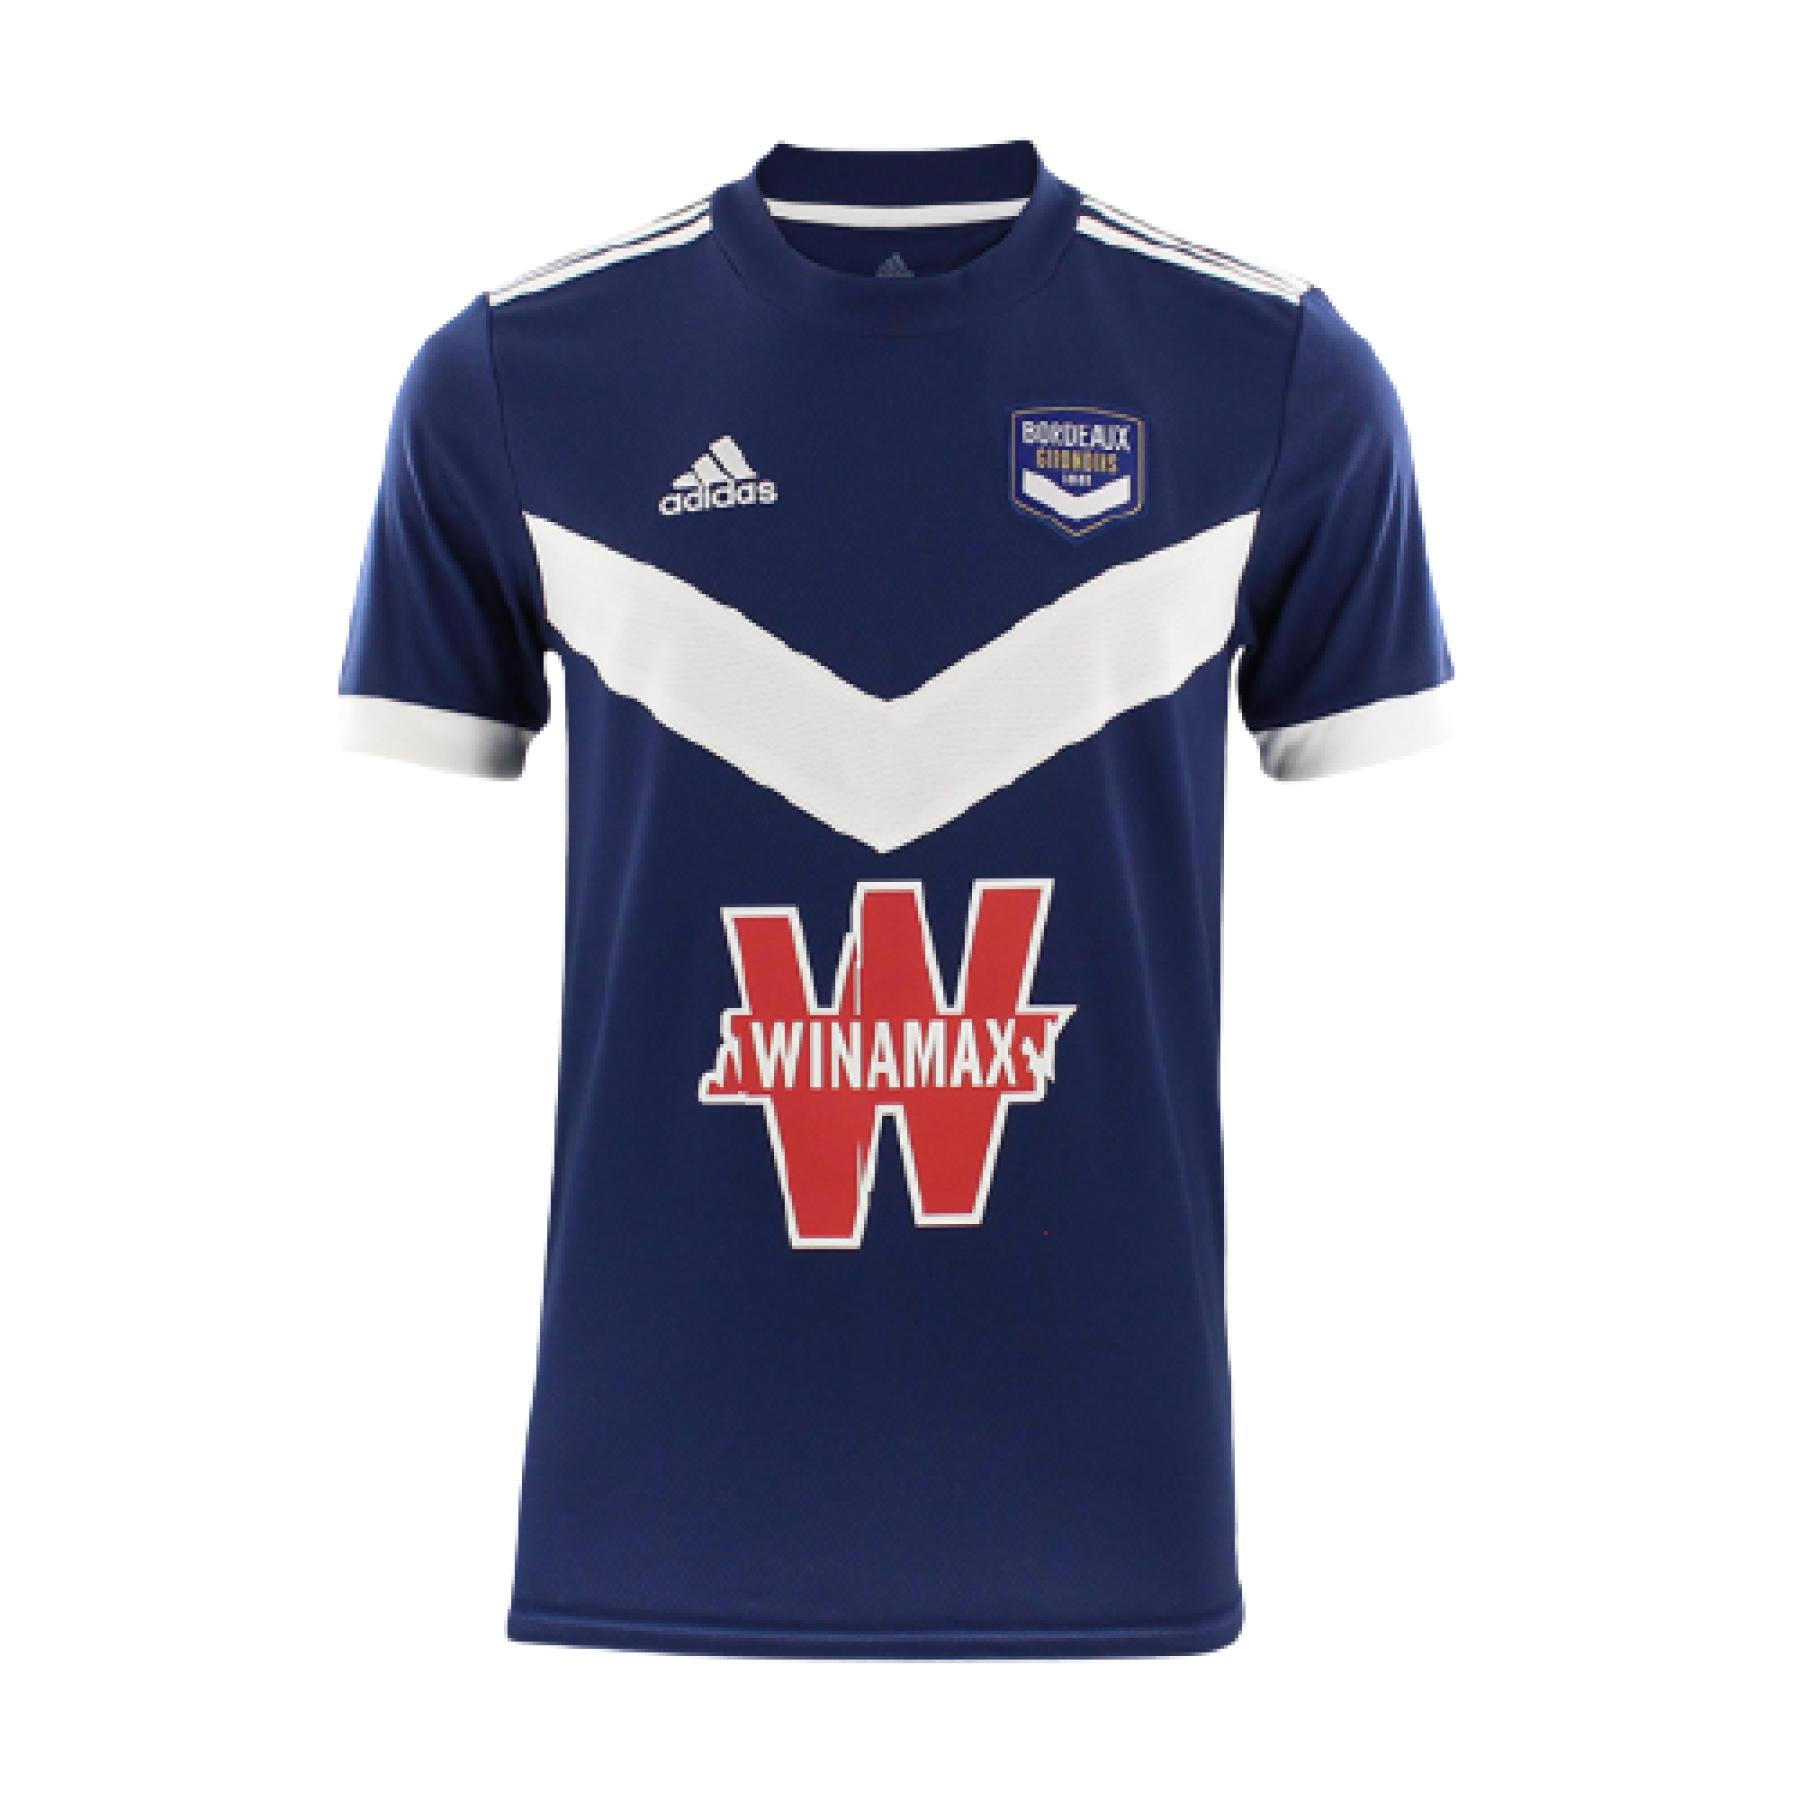 Home jersey Girondins de Bordeaux 2021/22